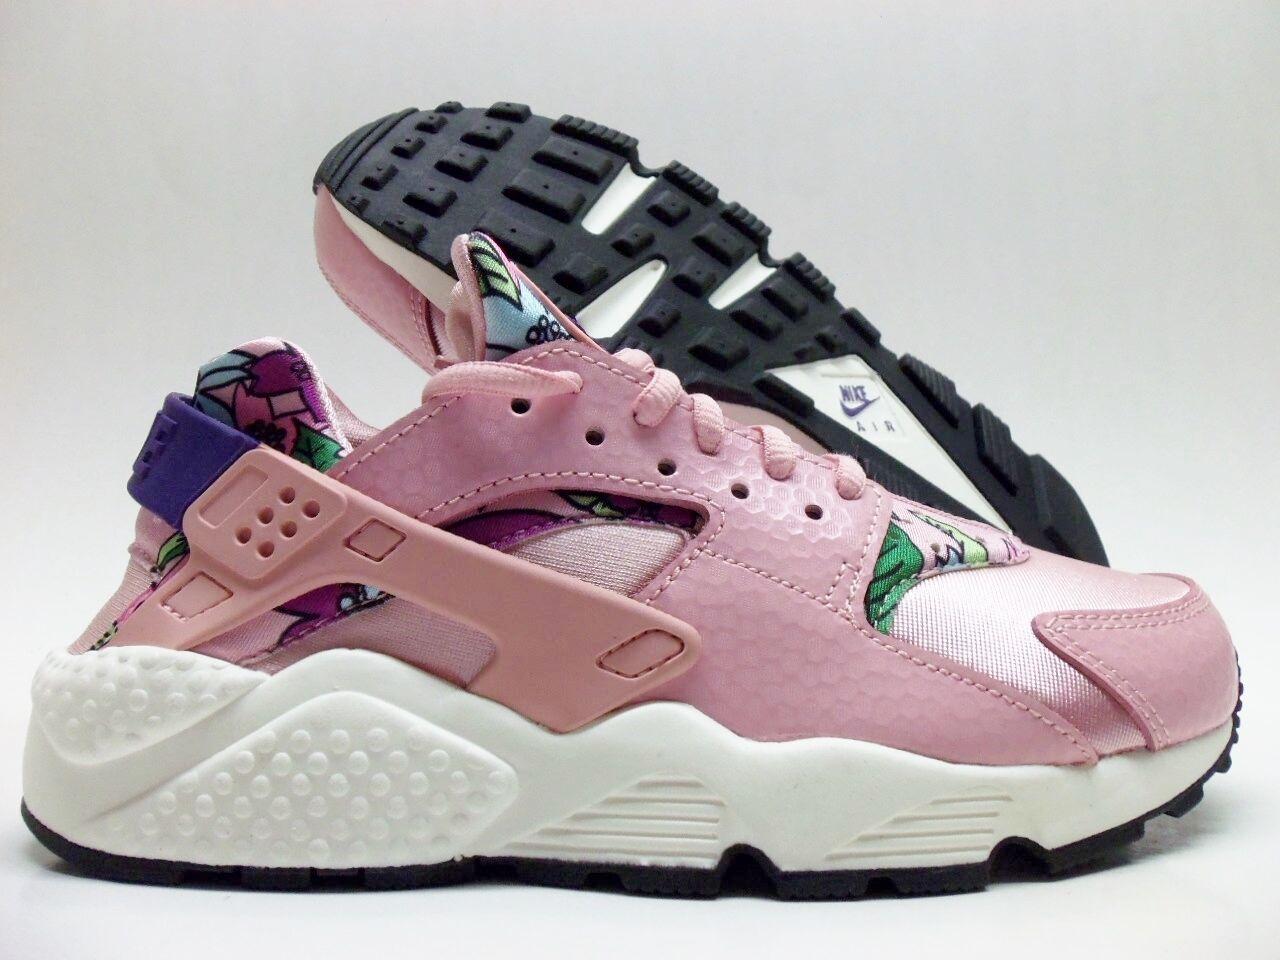 Nike Air huarache Run Print Rosa esmalte / purpel-Negro Talla de mujer 8 de reducción de Talla precio c281ad